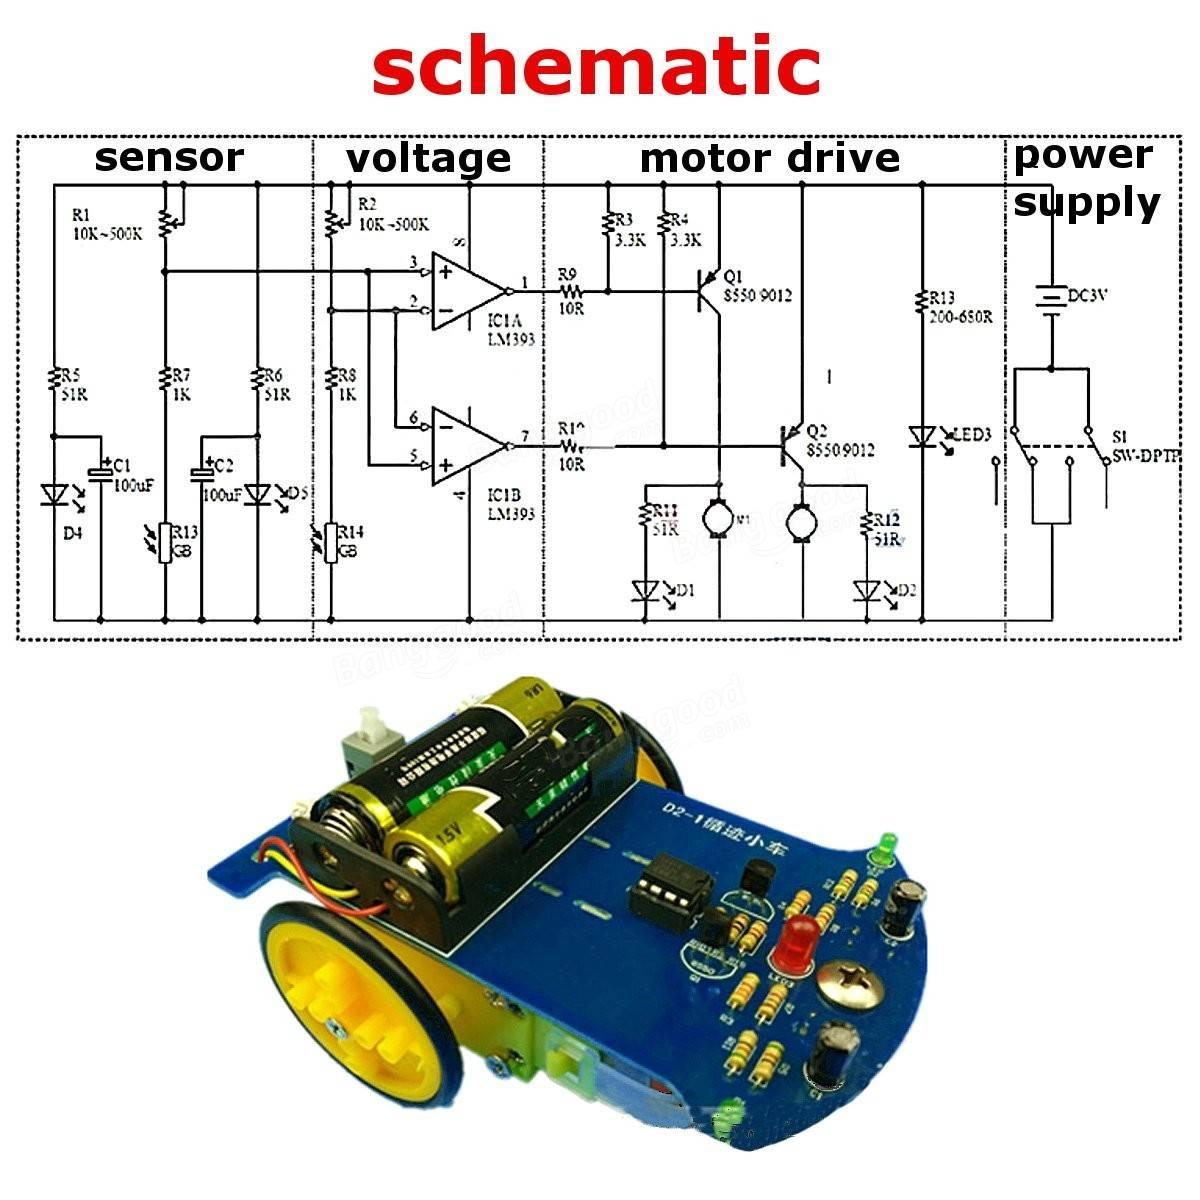 6 volt positive ground wiring diagram bsa capacitior